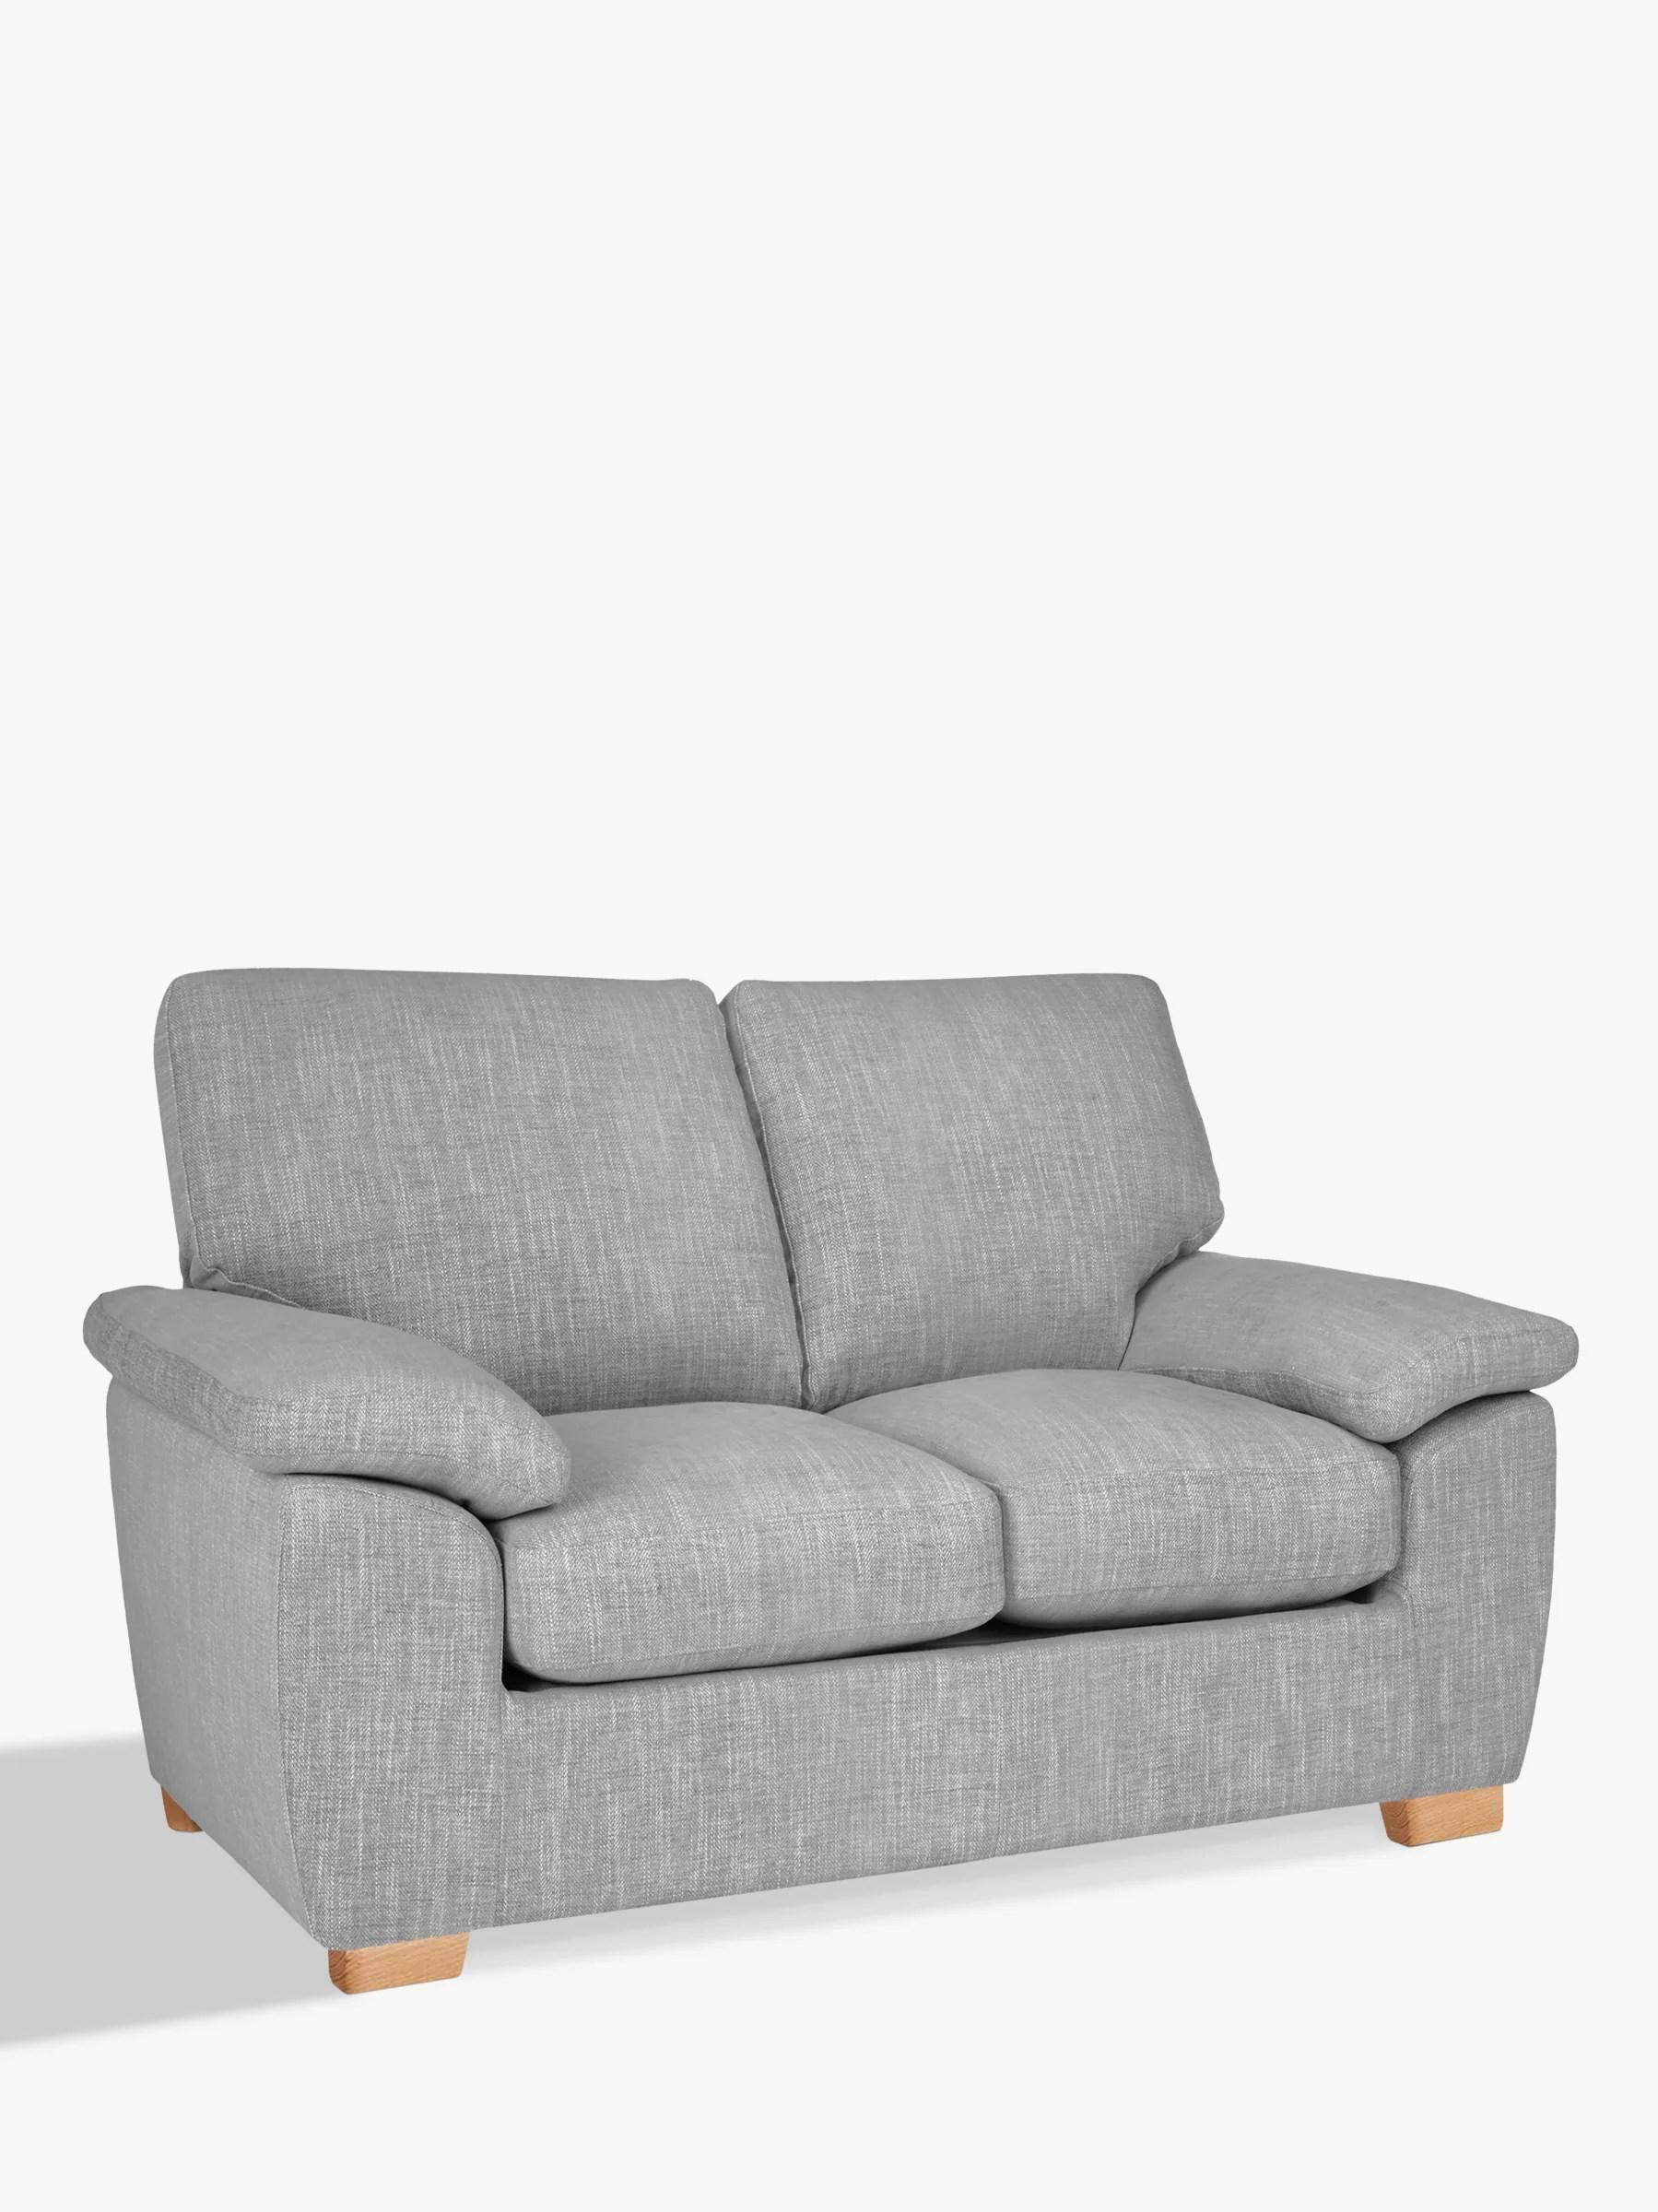 camden sofa john lewis tri fold small 2 seater bluewater 799 00